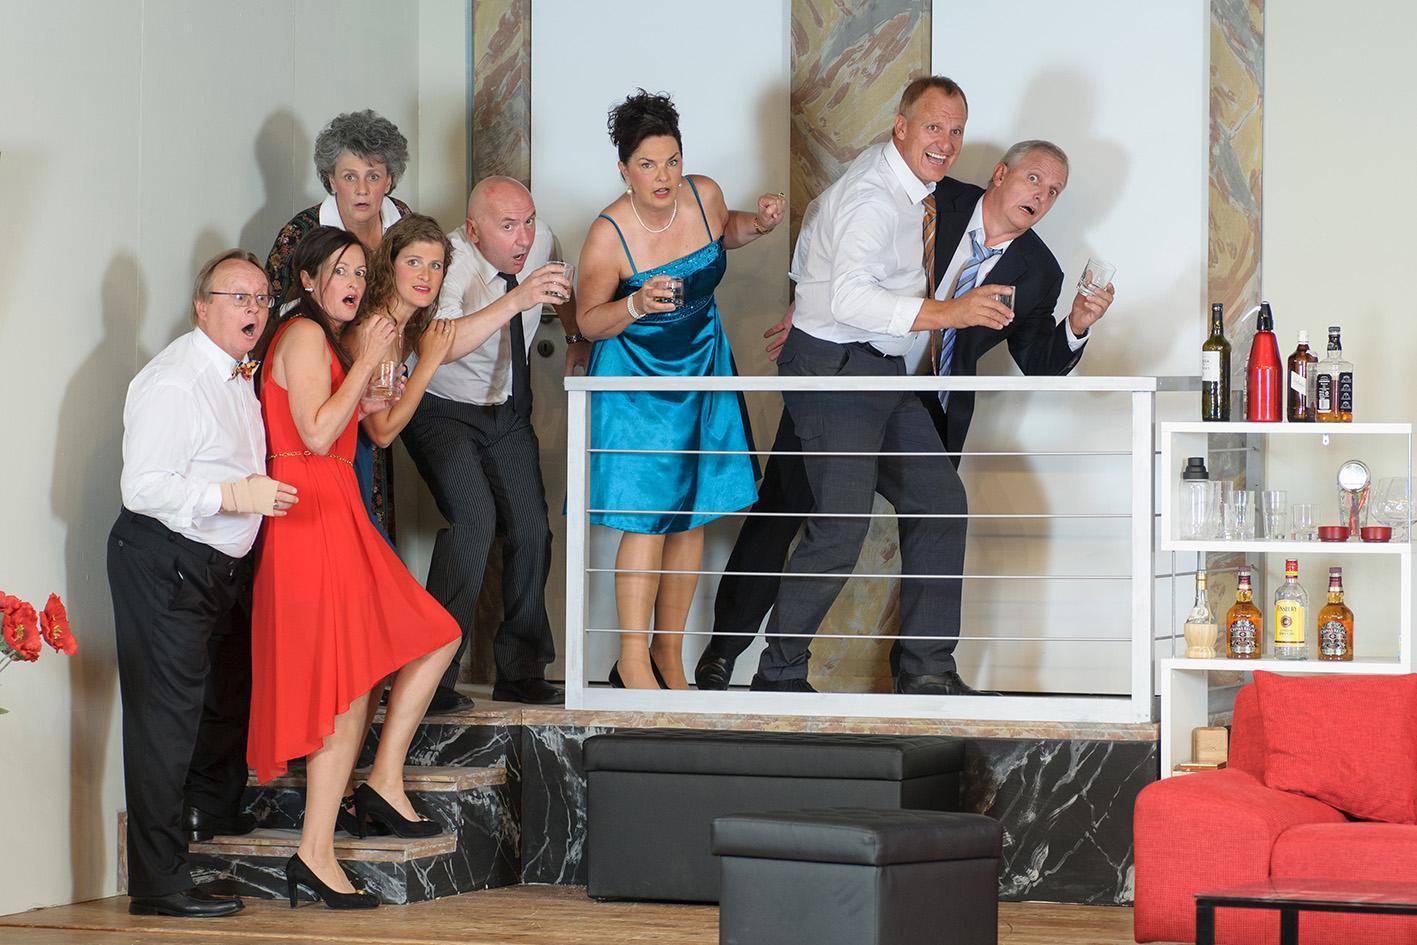 Theatergruppe Spektakel